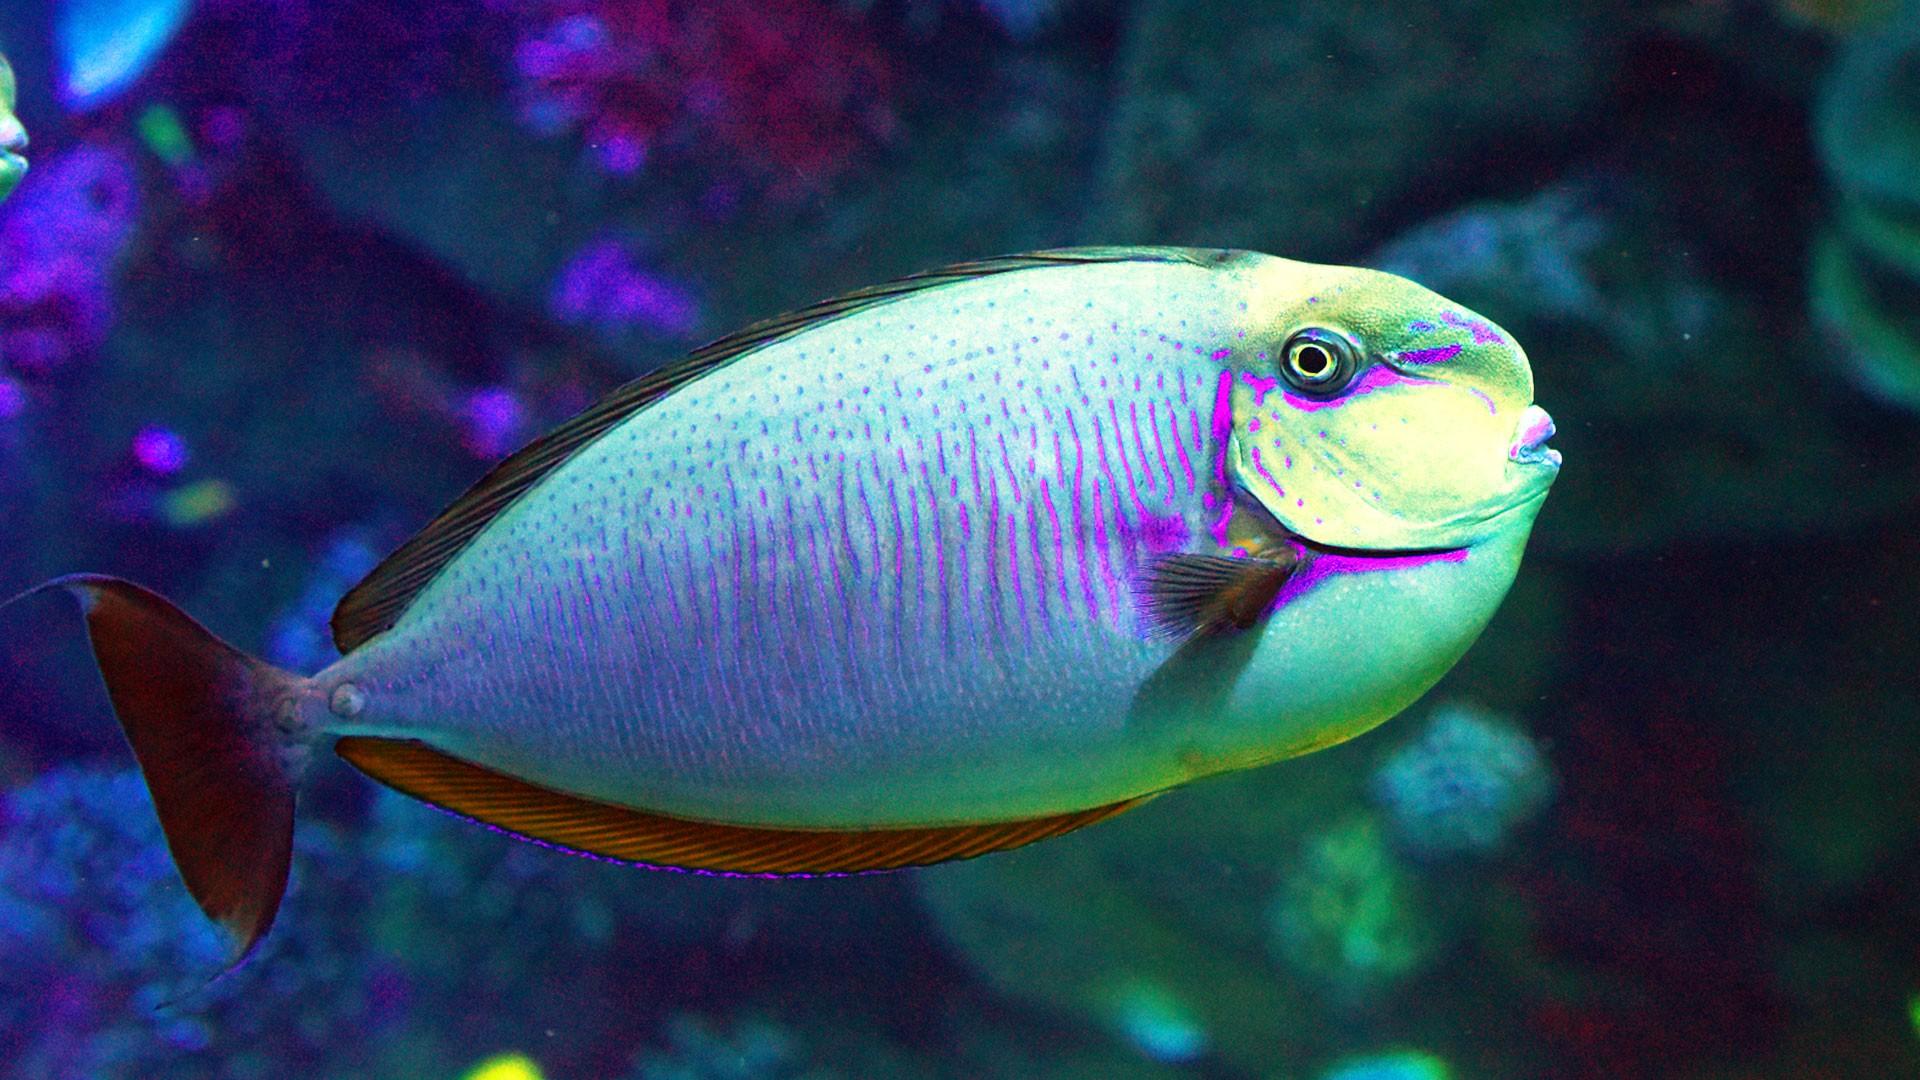 Vlamigni Surgeonfish